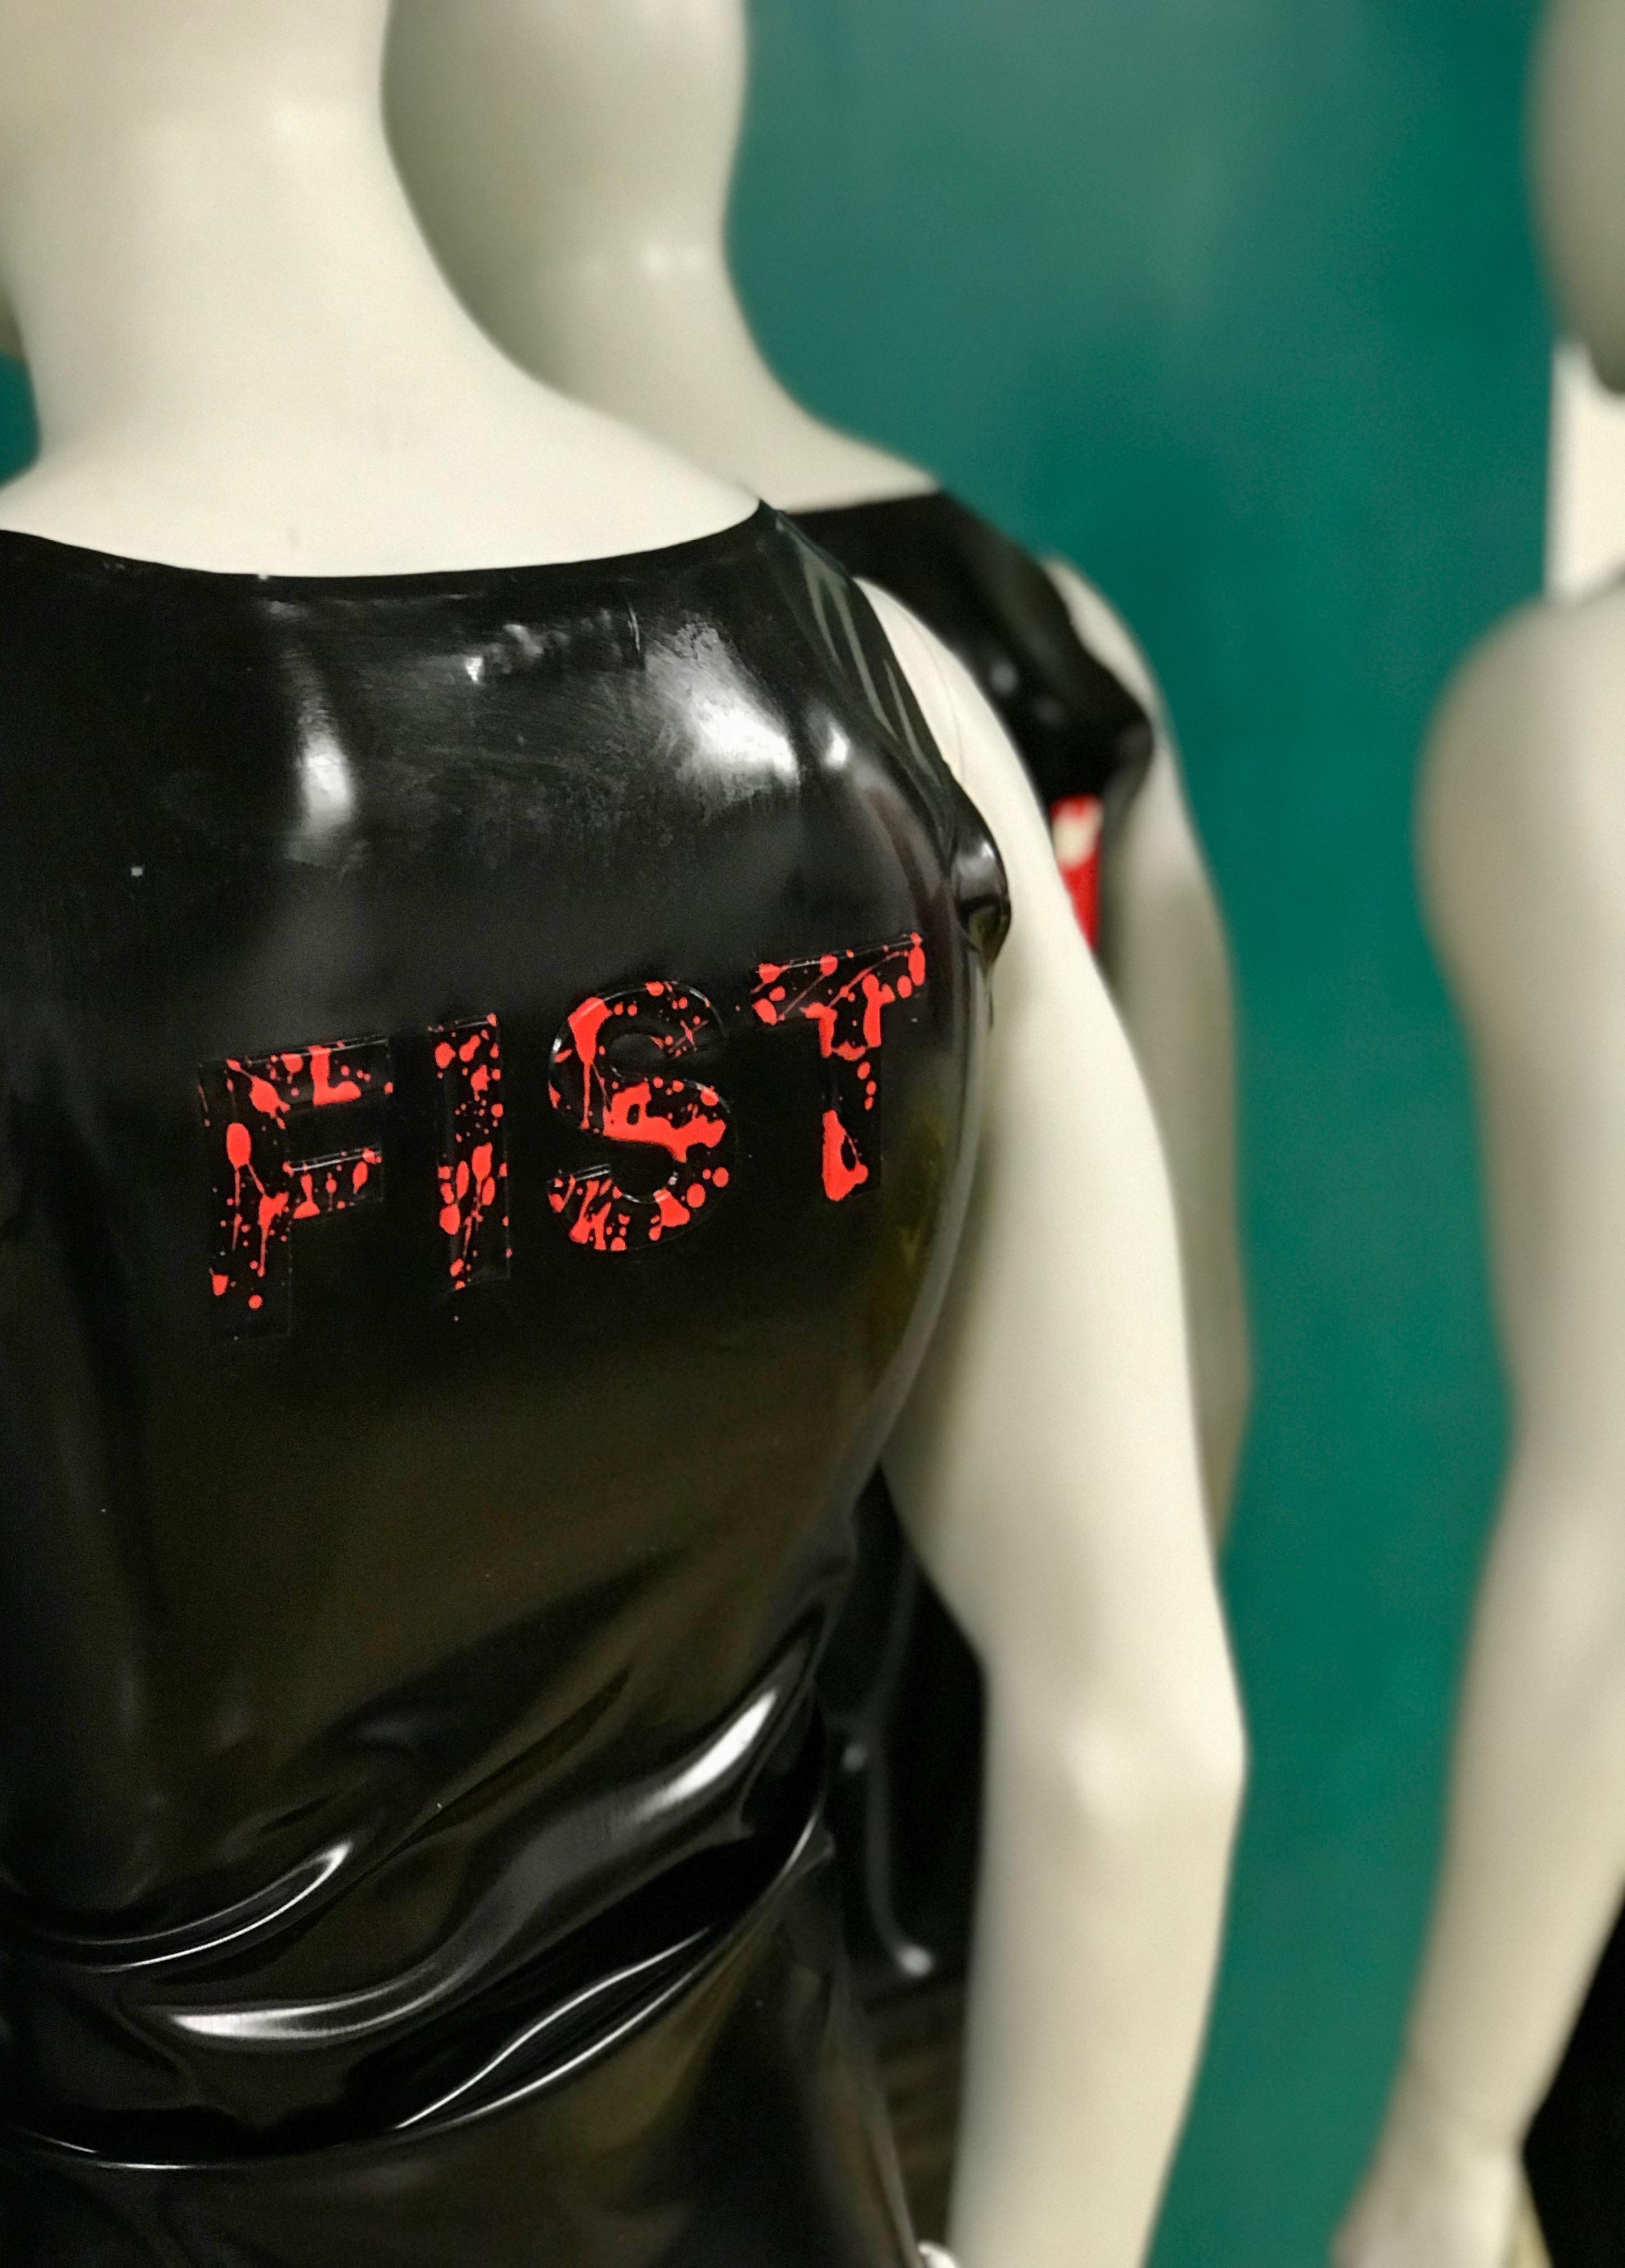 f526123ba5 Sven Appelt Rubber - Latex Fashion Store Berlin - Onlineshop